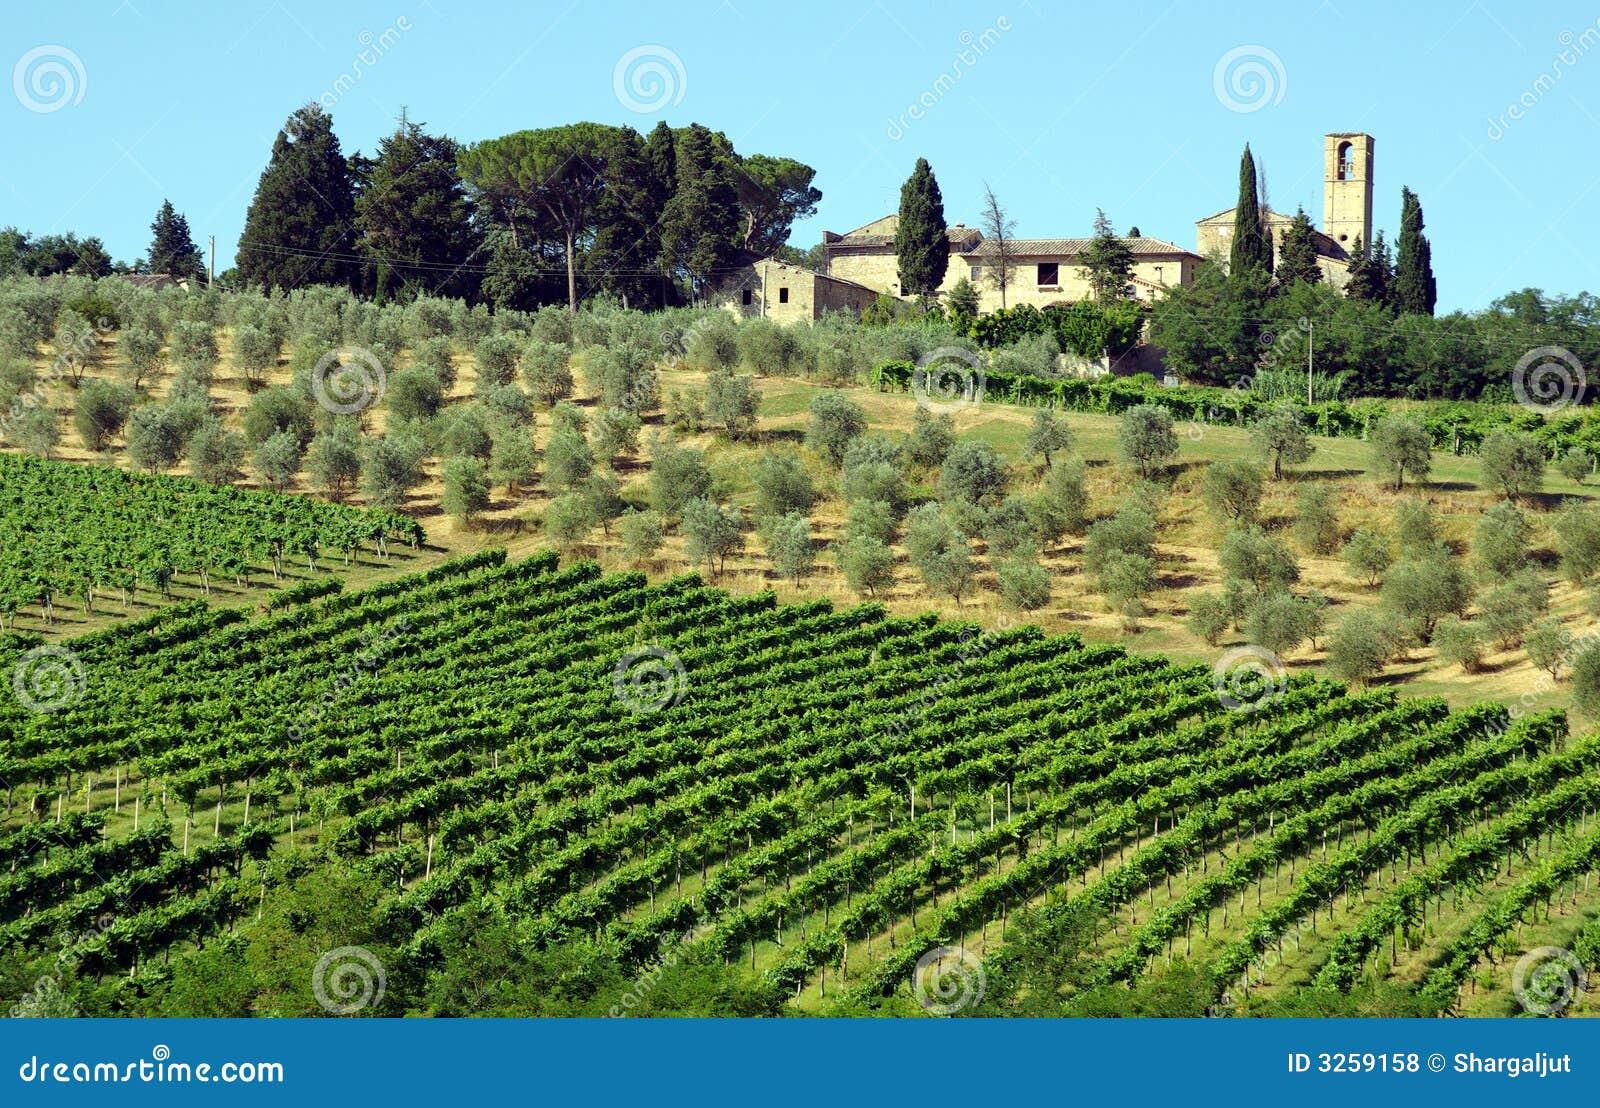 Granja en Toscana, Italia